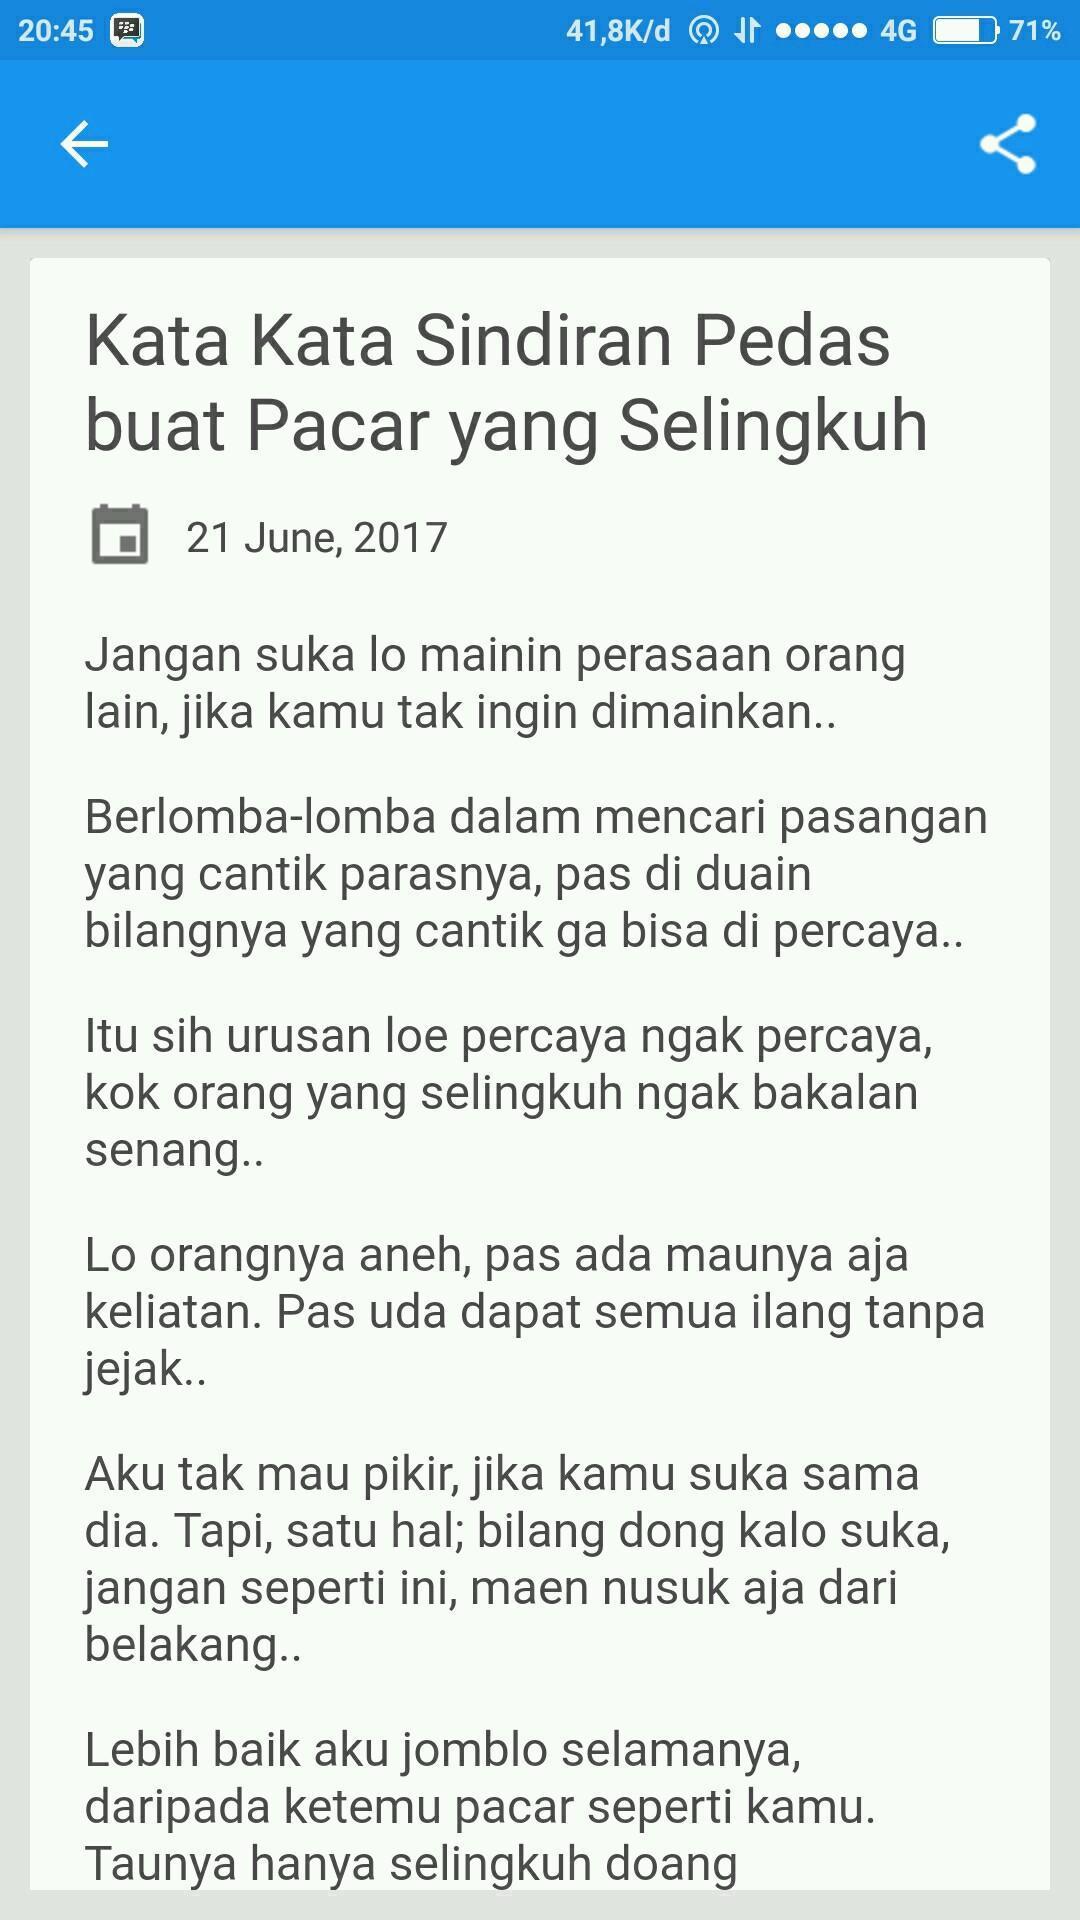 Kata Sindiran Sadis Pedas For Android Apk Download